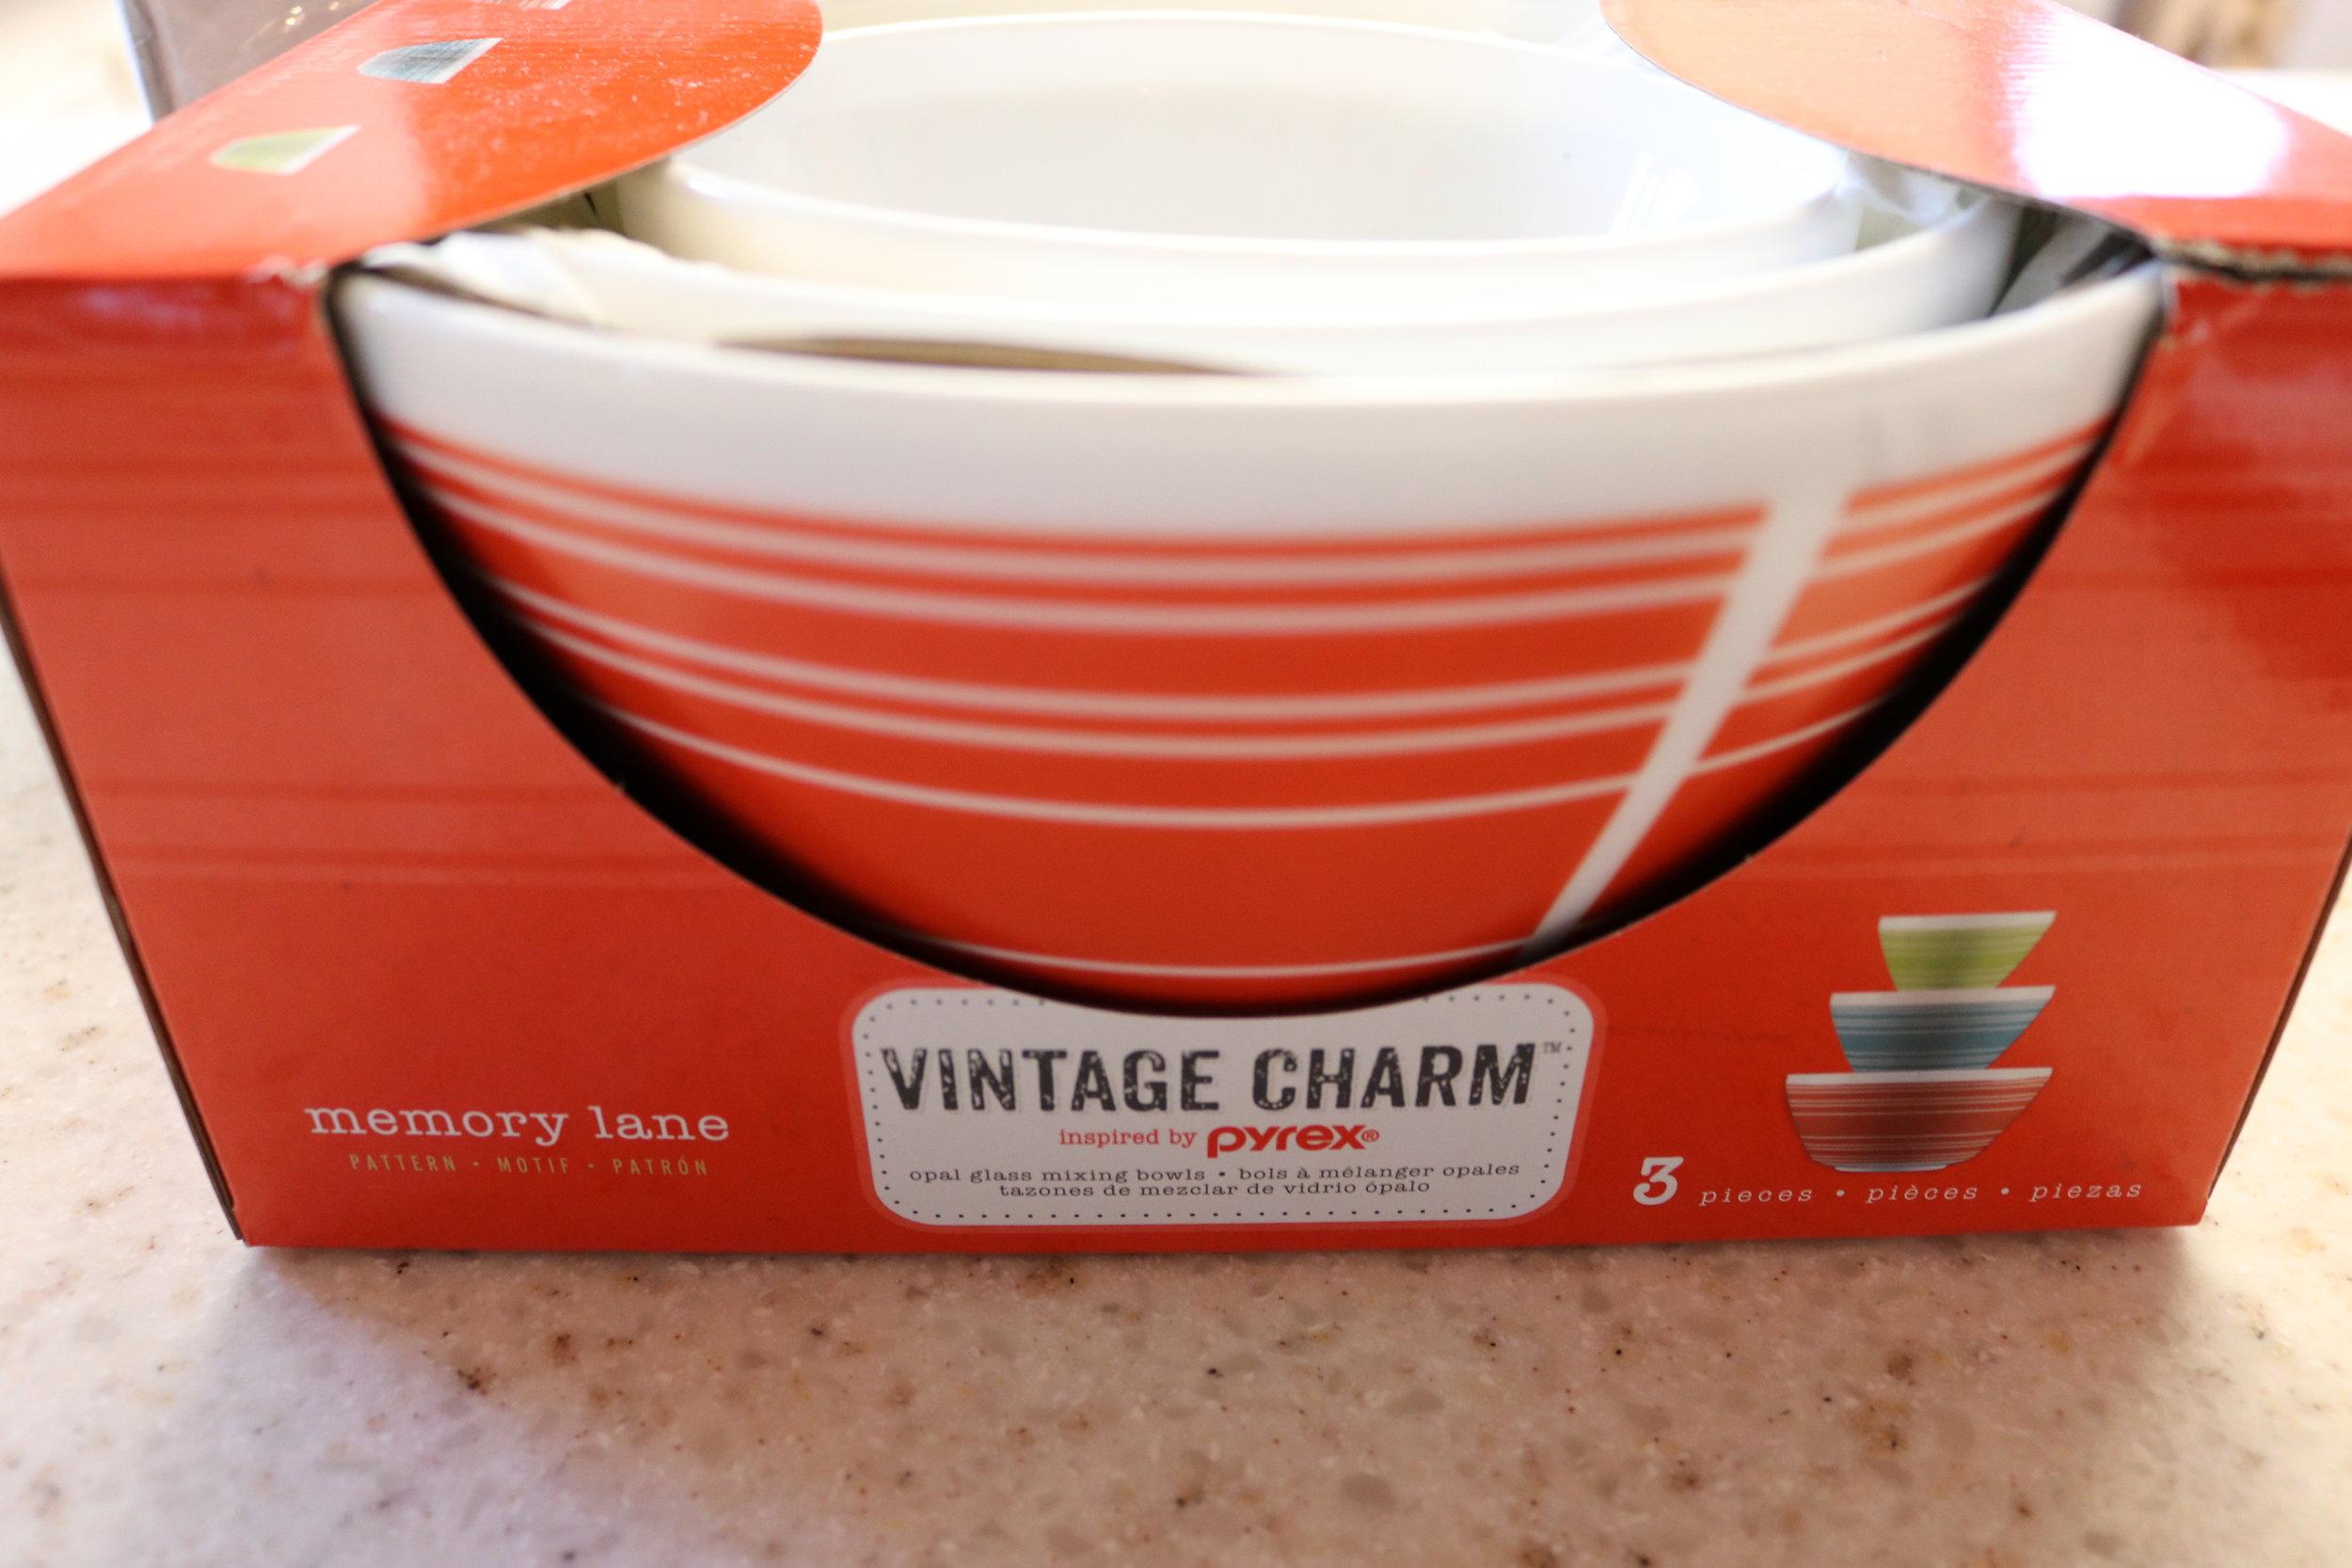 Pyrex Mixing Bowls Vintage Charm Review - whatthegirlssay.com